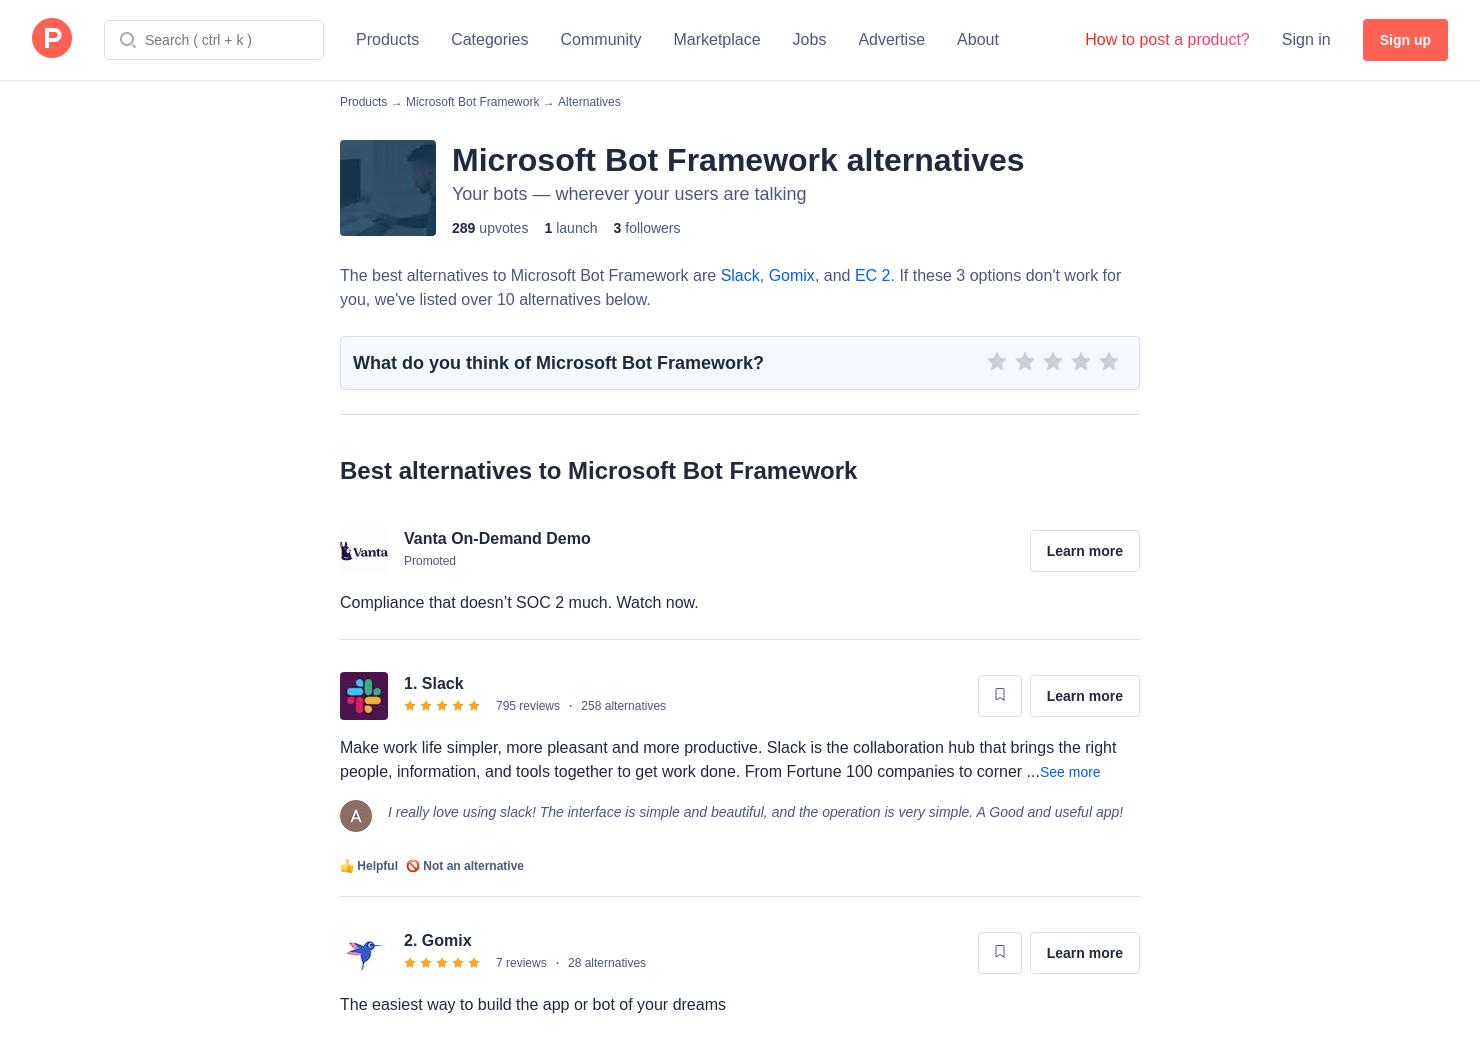 14 Alternatives to Microsoft Bot Framework | Product Hunt